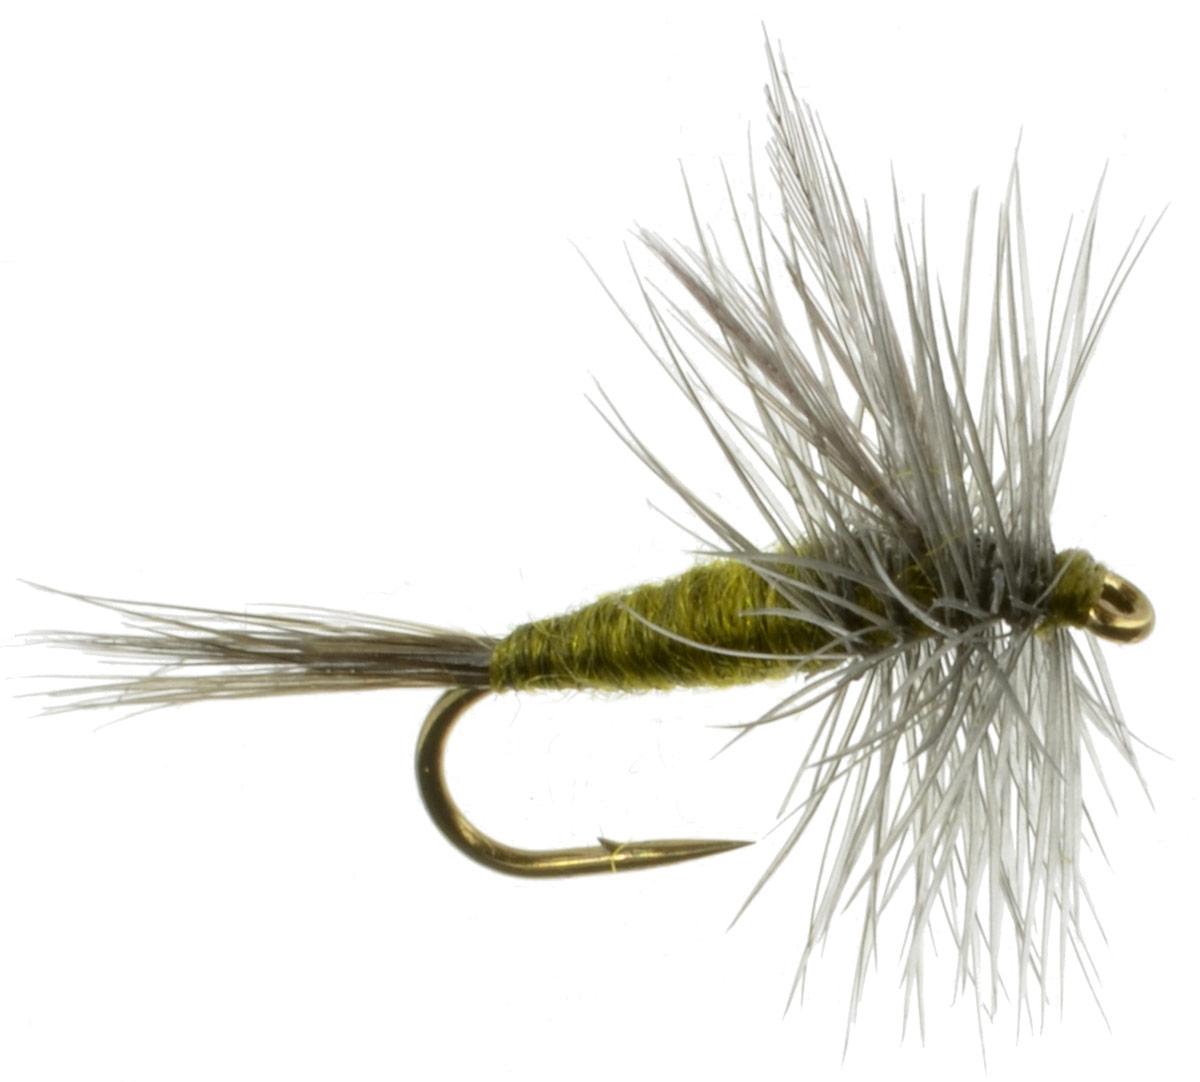 Baetis (BWO) Dry Flies : Top Fly Fishing Flies & Gear At Wholesale Prices